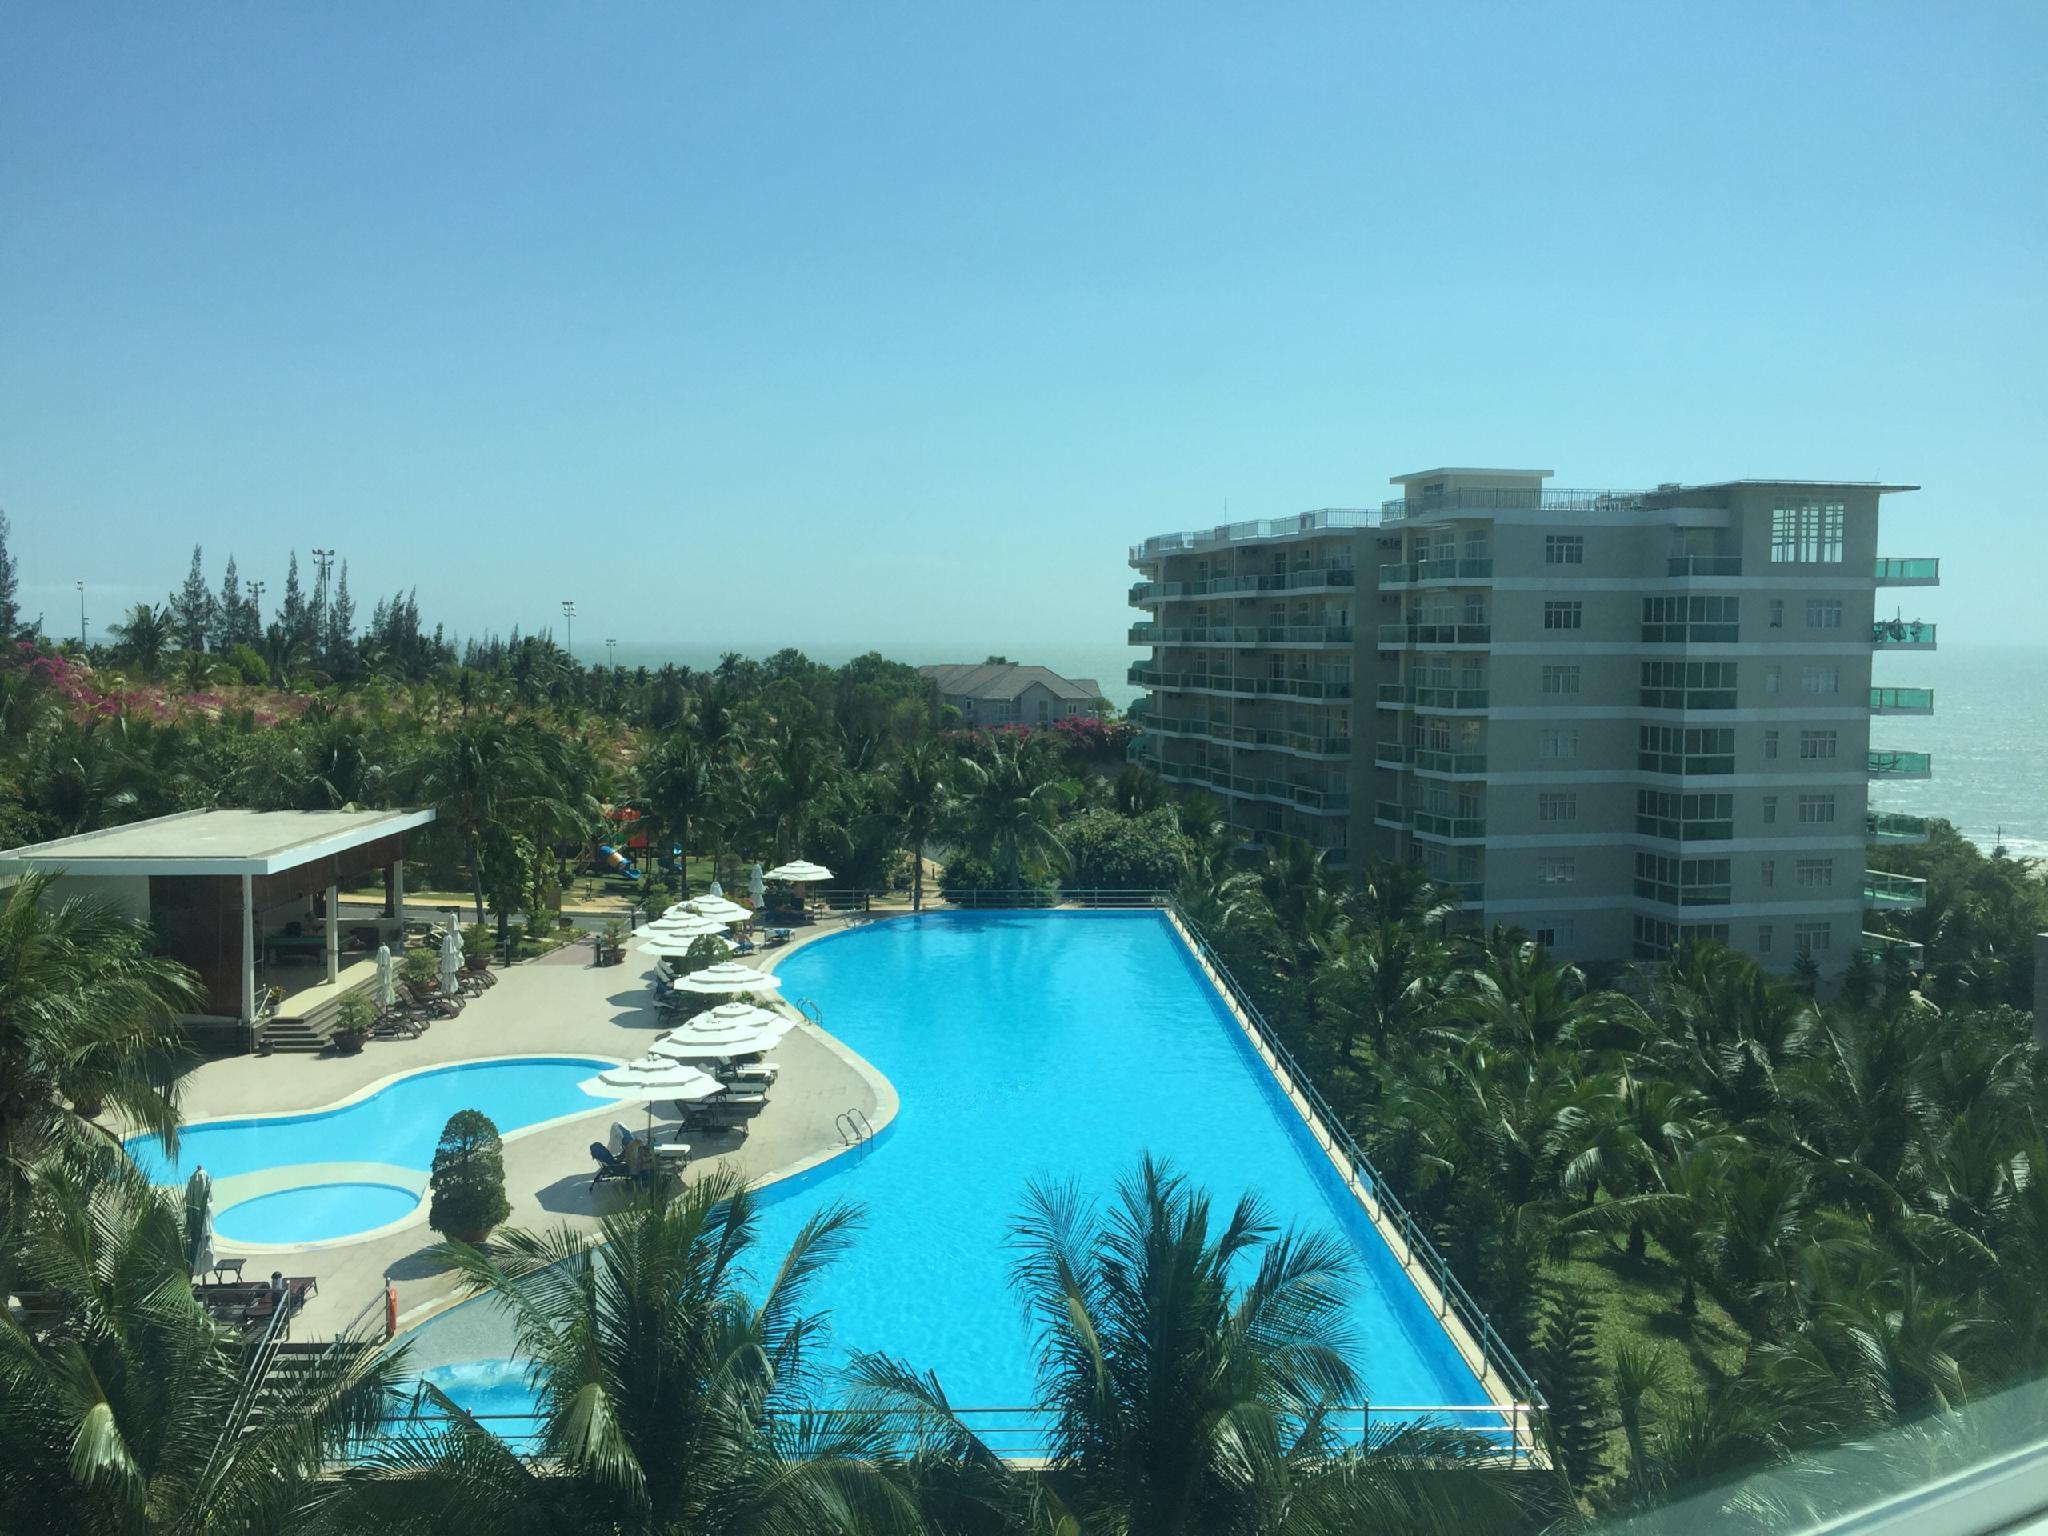 Sea View 3BR Apt In 5* Resort In Phan Thiet